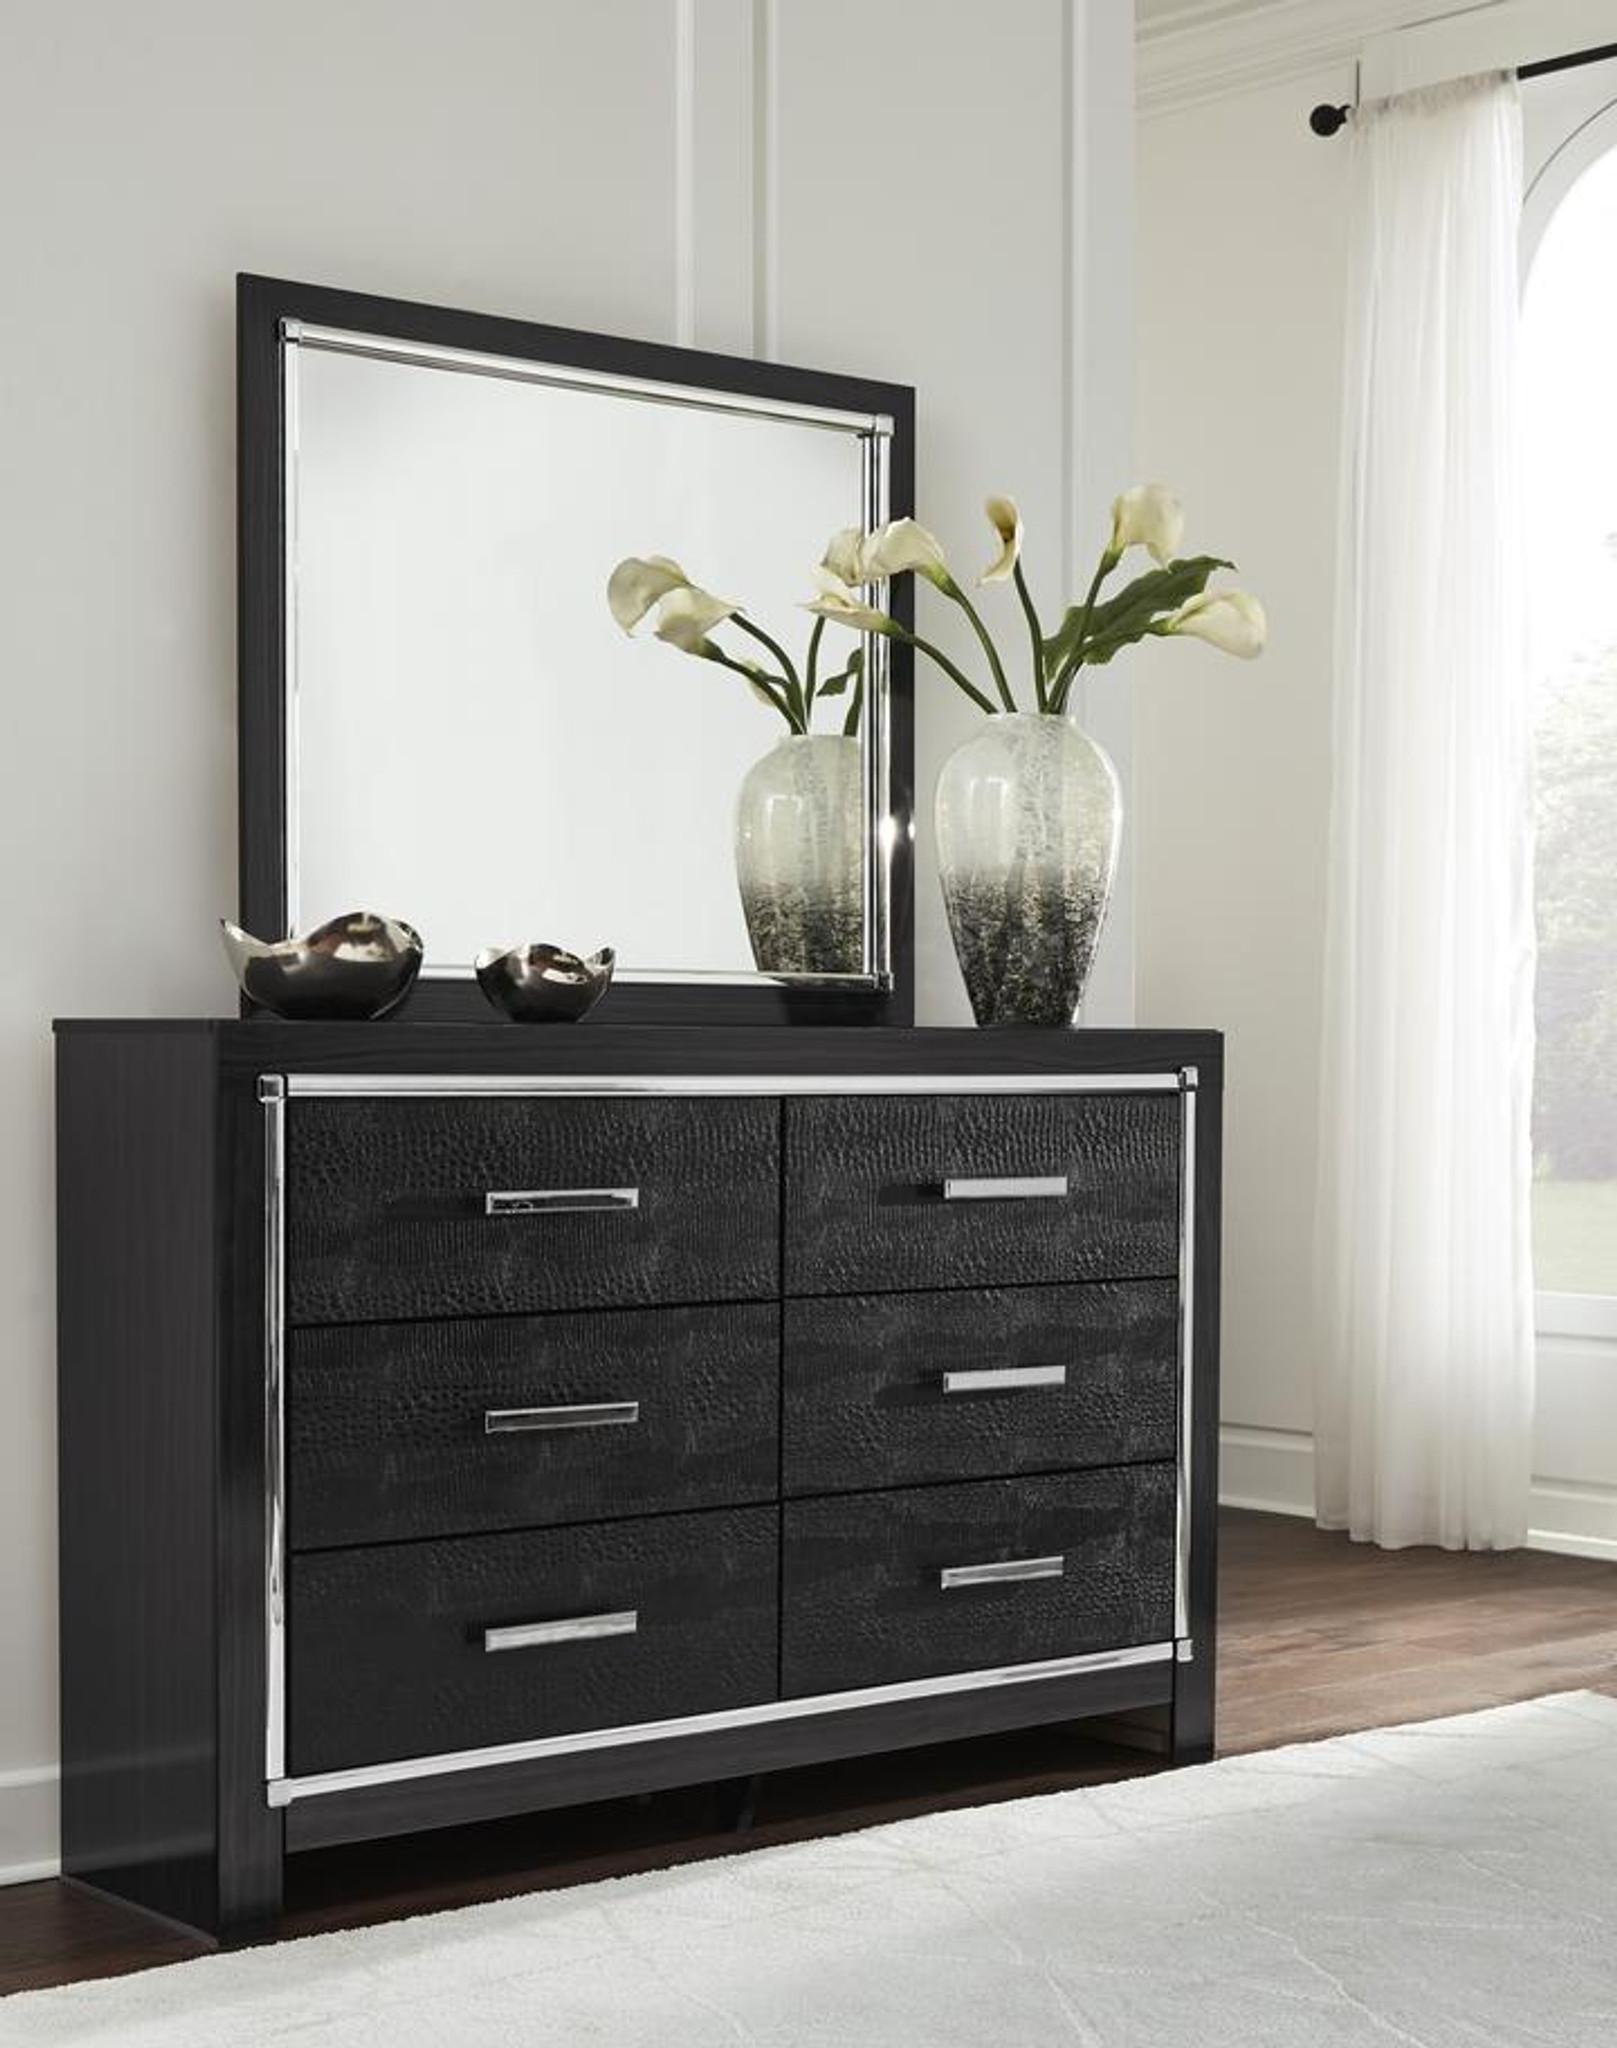 6 Pc Kaydell Black Led Panel Bedroom Set By Km Home Furniture Houston Texas